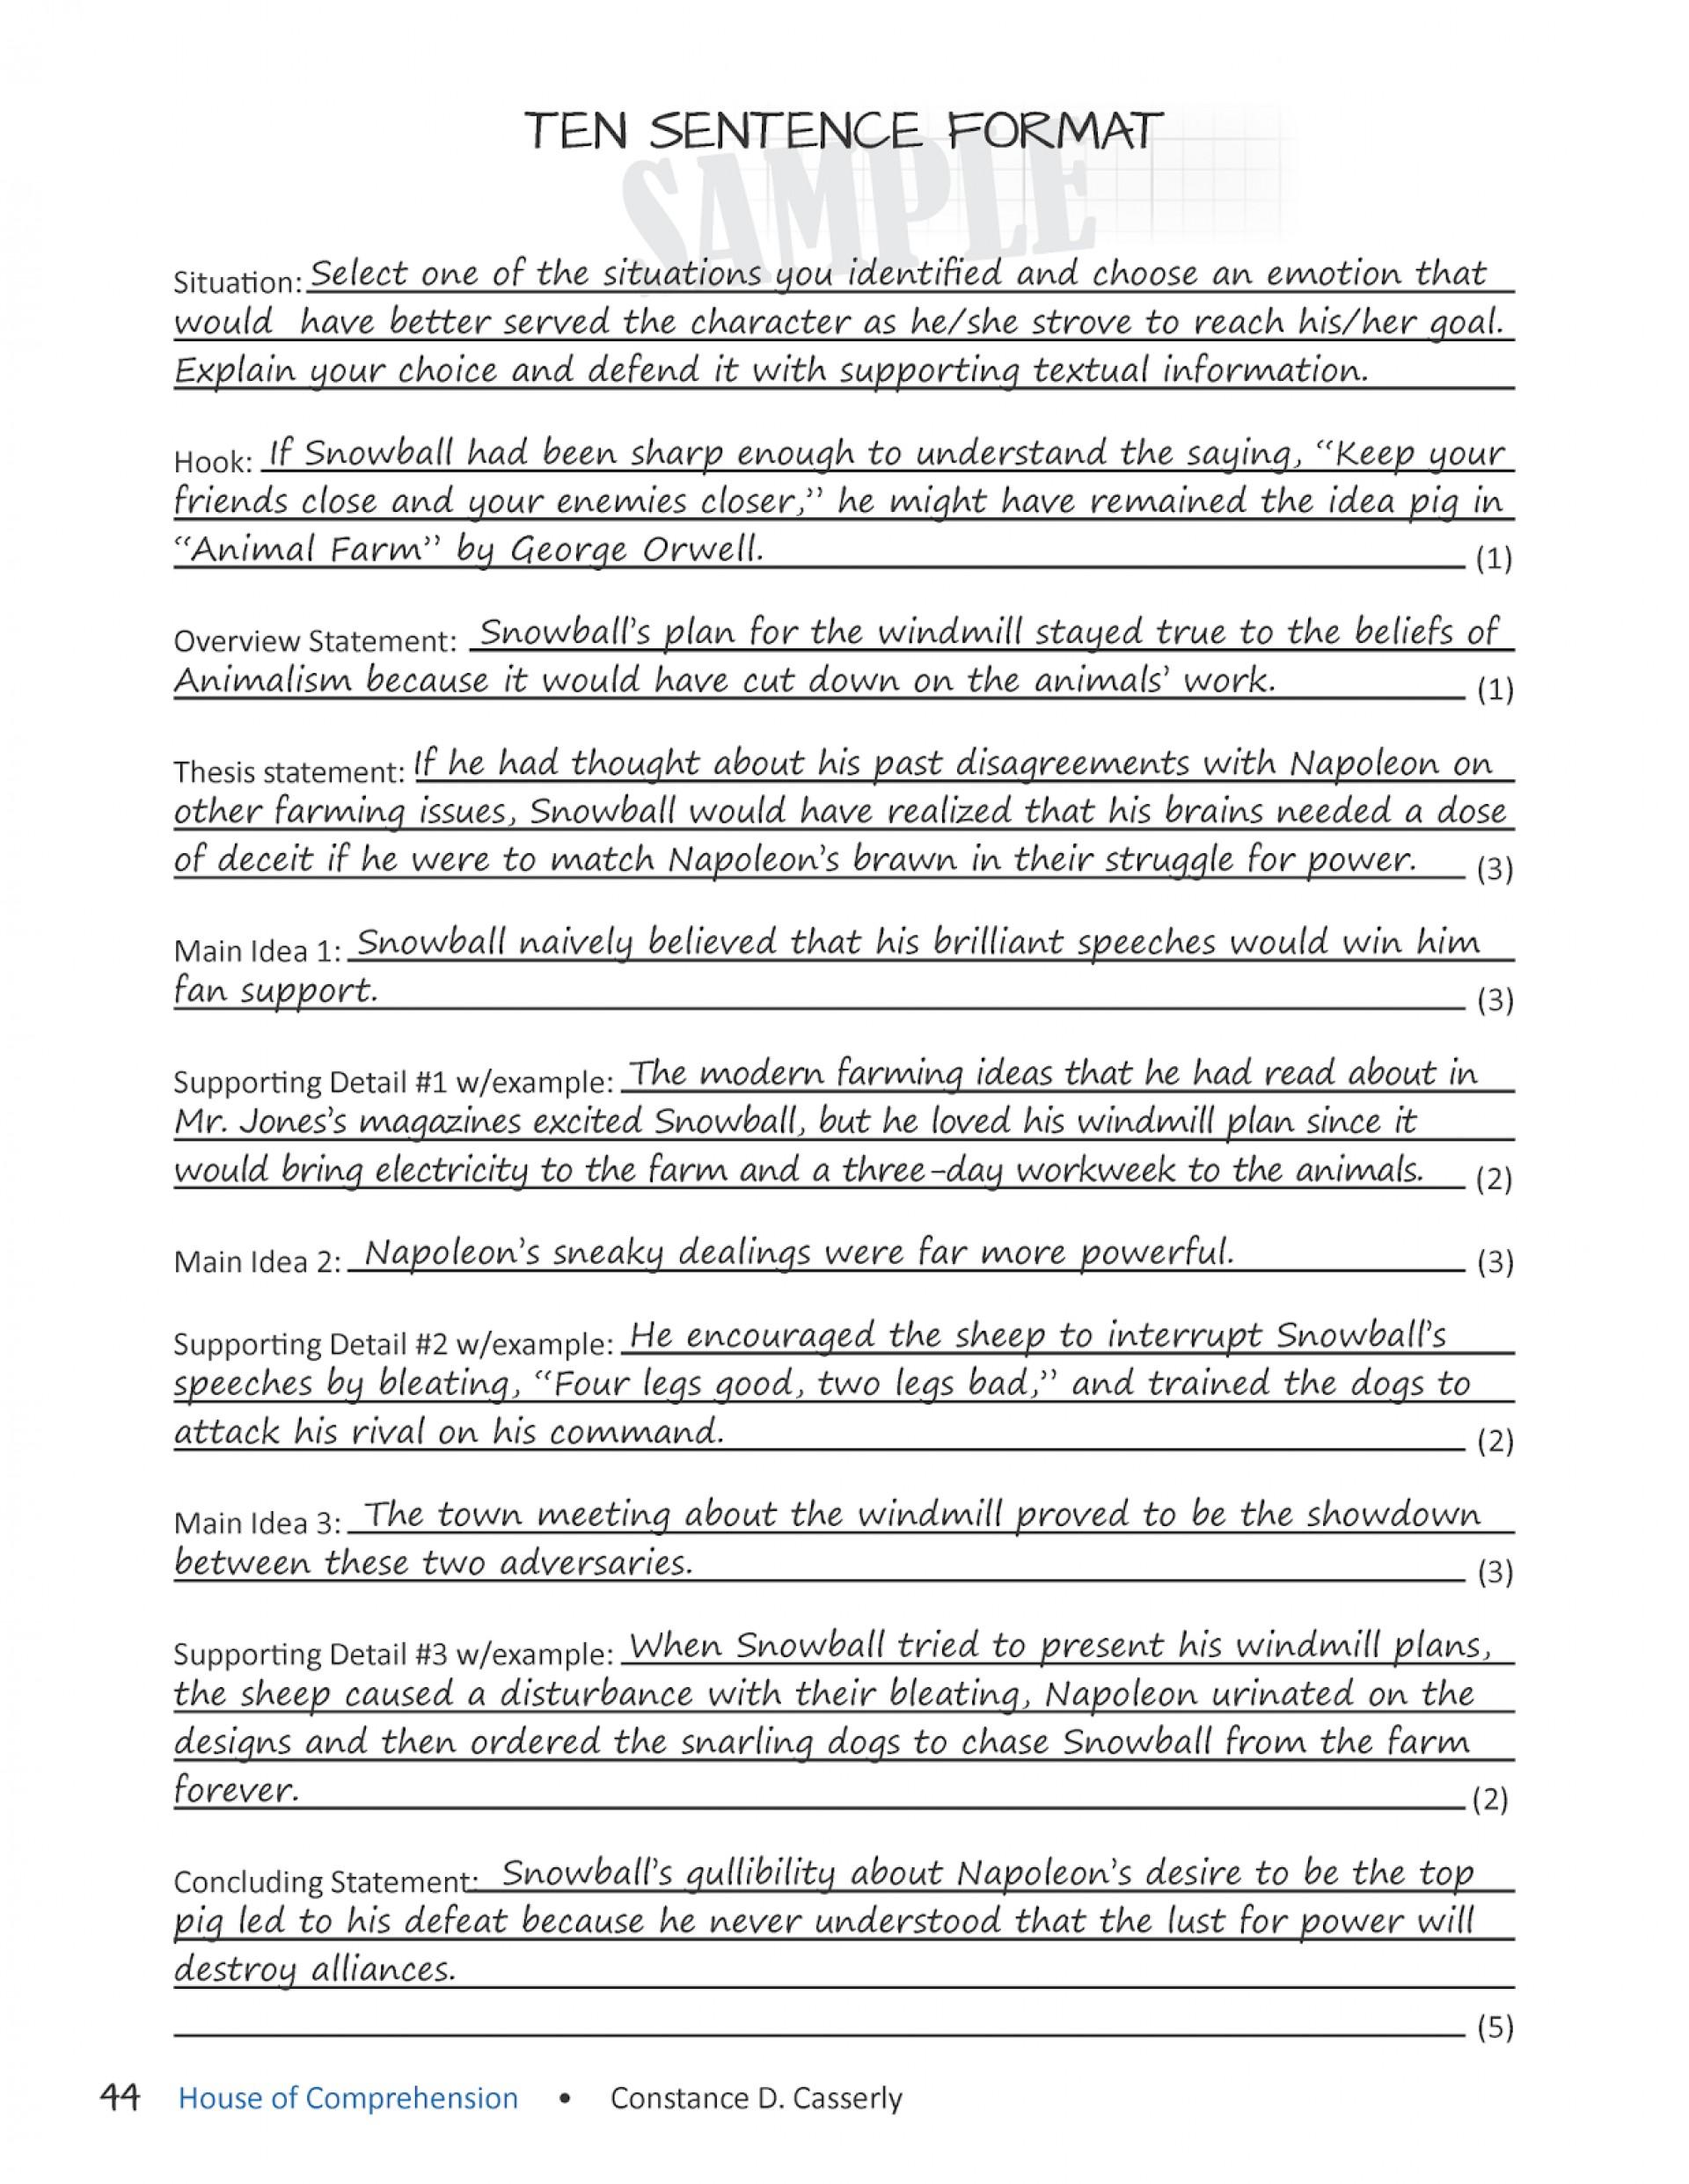 012 Languageartscomprehensionchecktensentenceformat25252b252525252812525252529 Page 5 Causal Argument Essay Topics Imposing Topic Ideas Good 1920